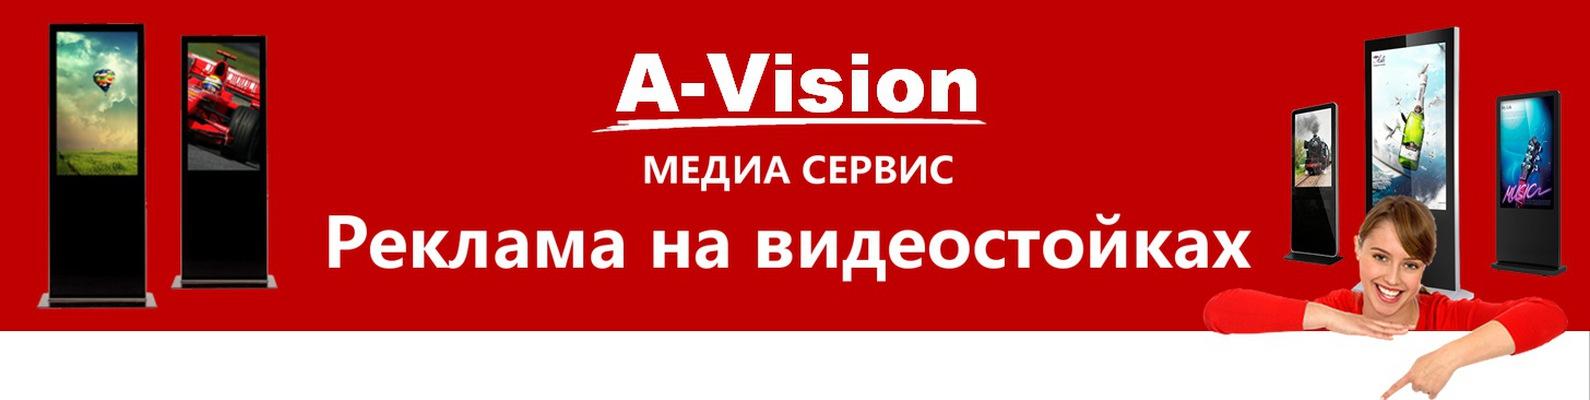 вконтакте a vision